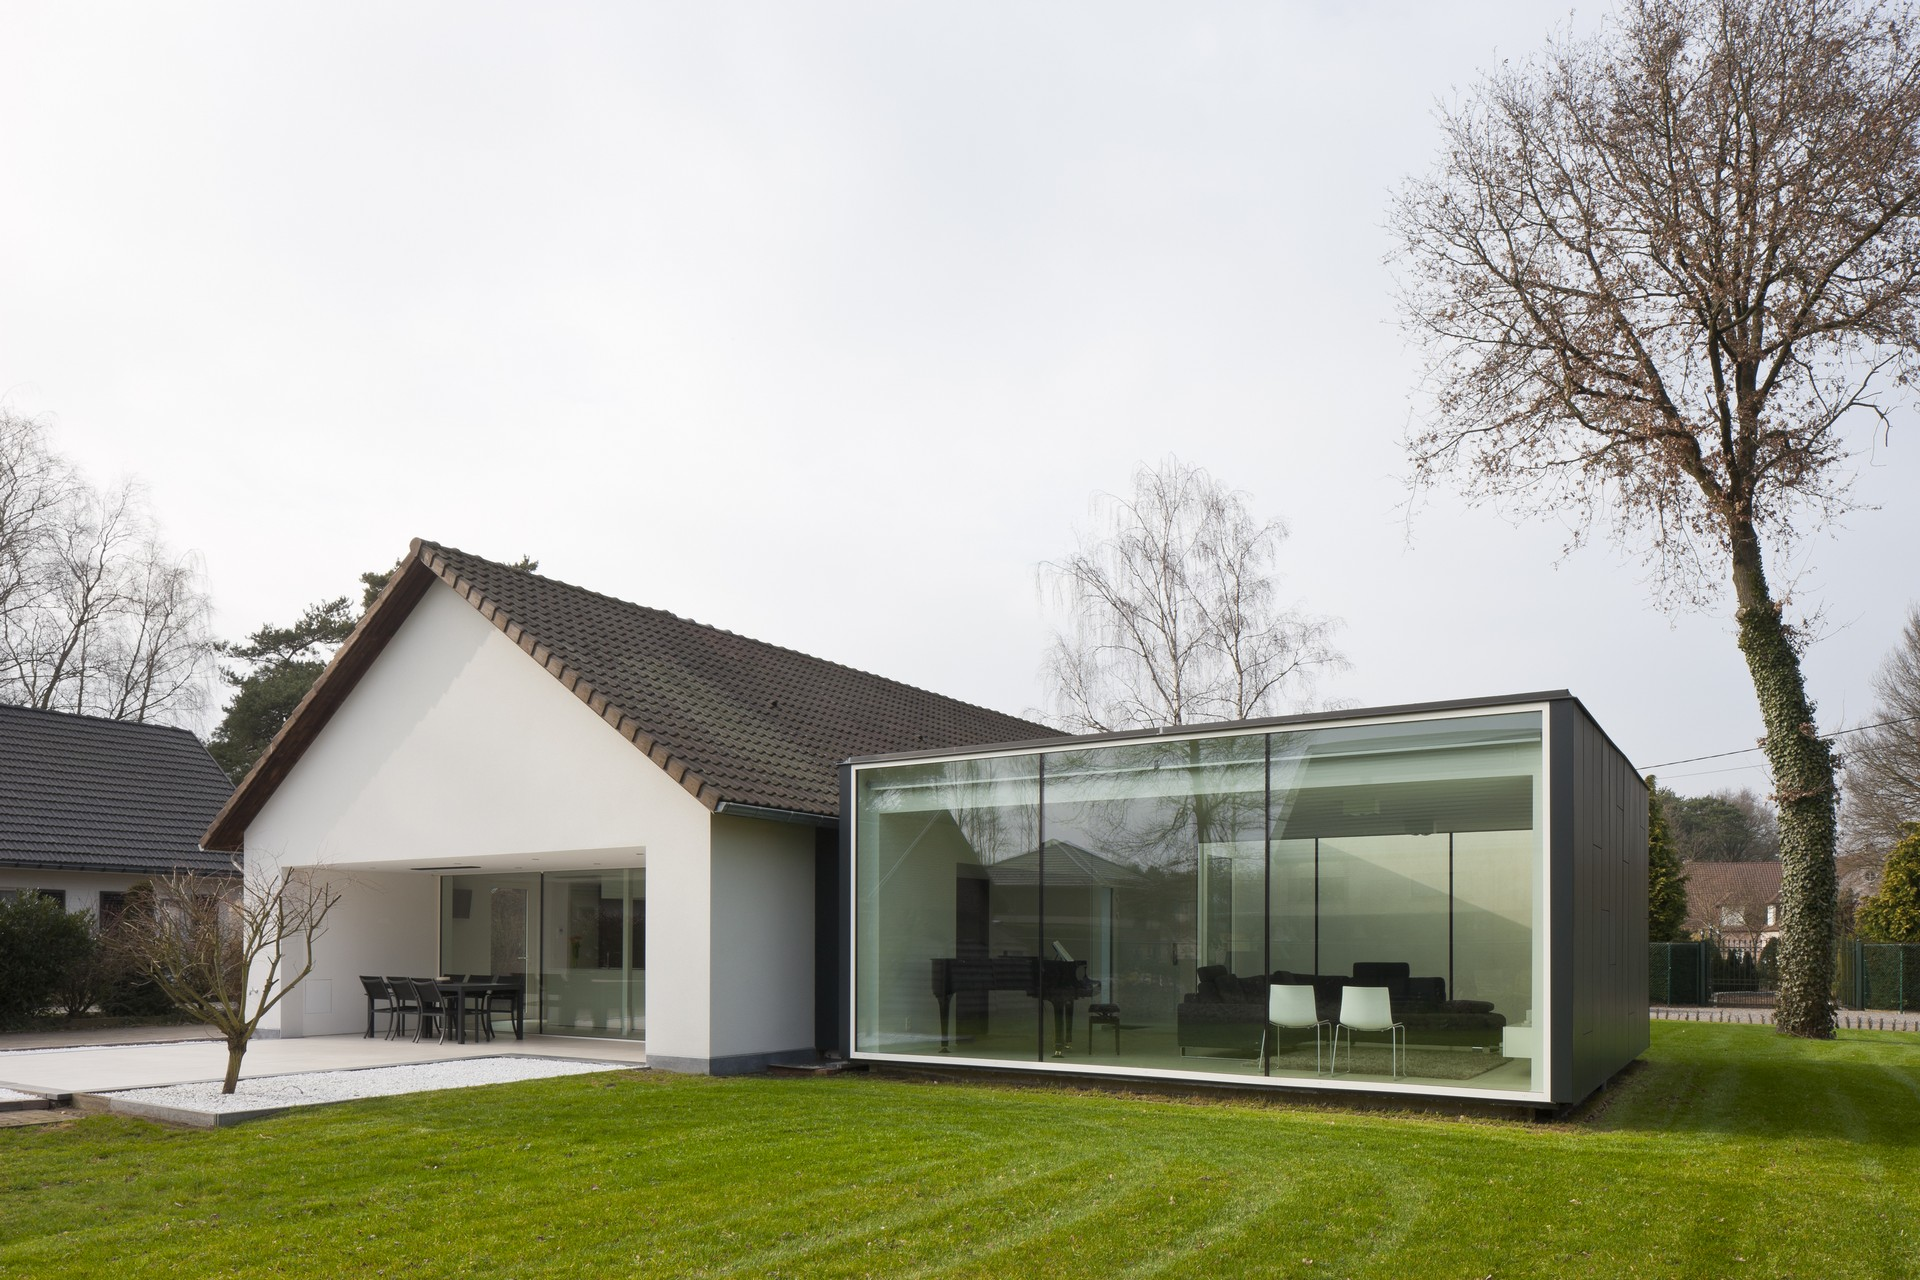 Framework house